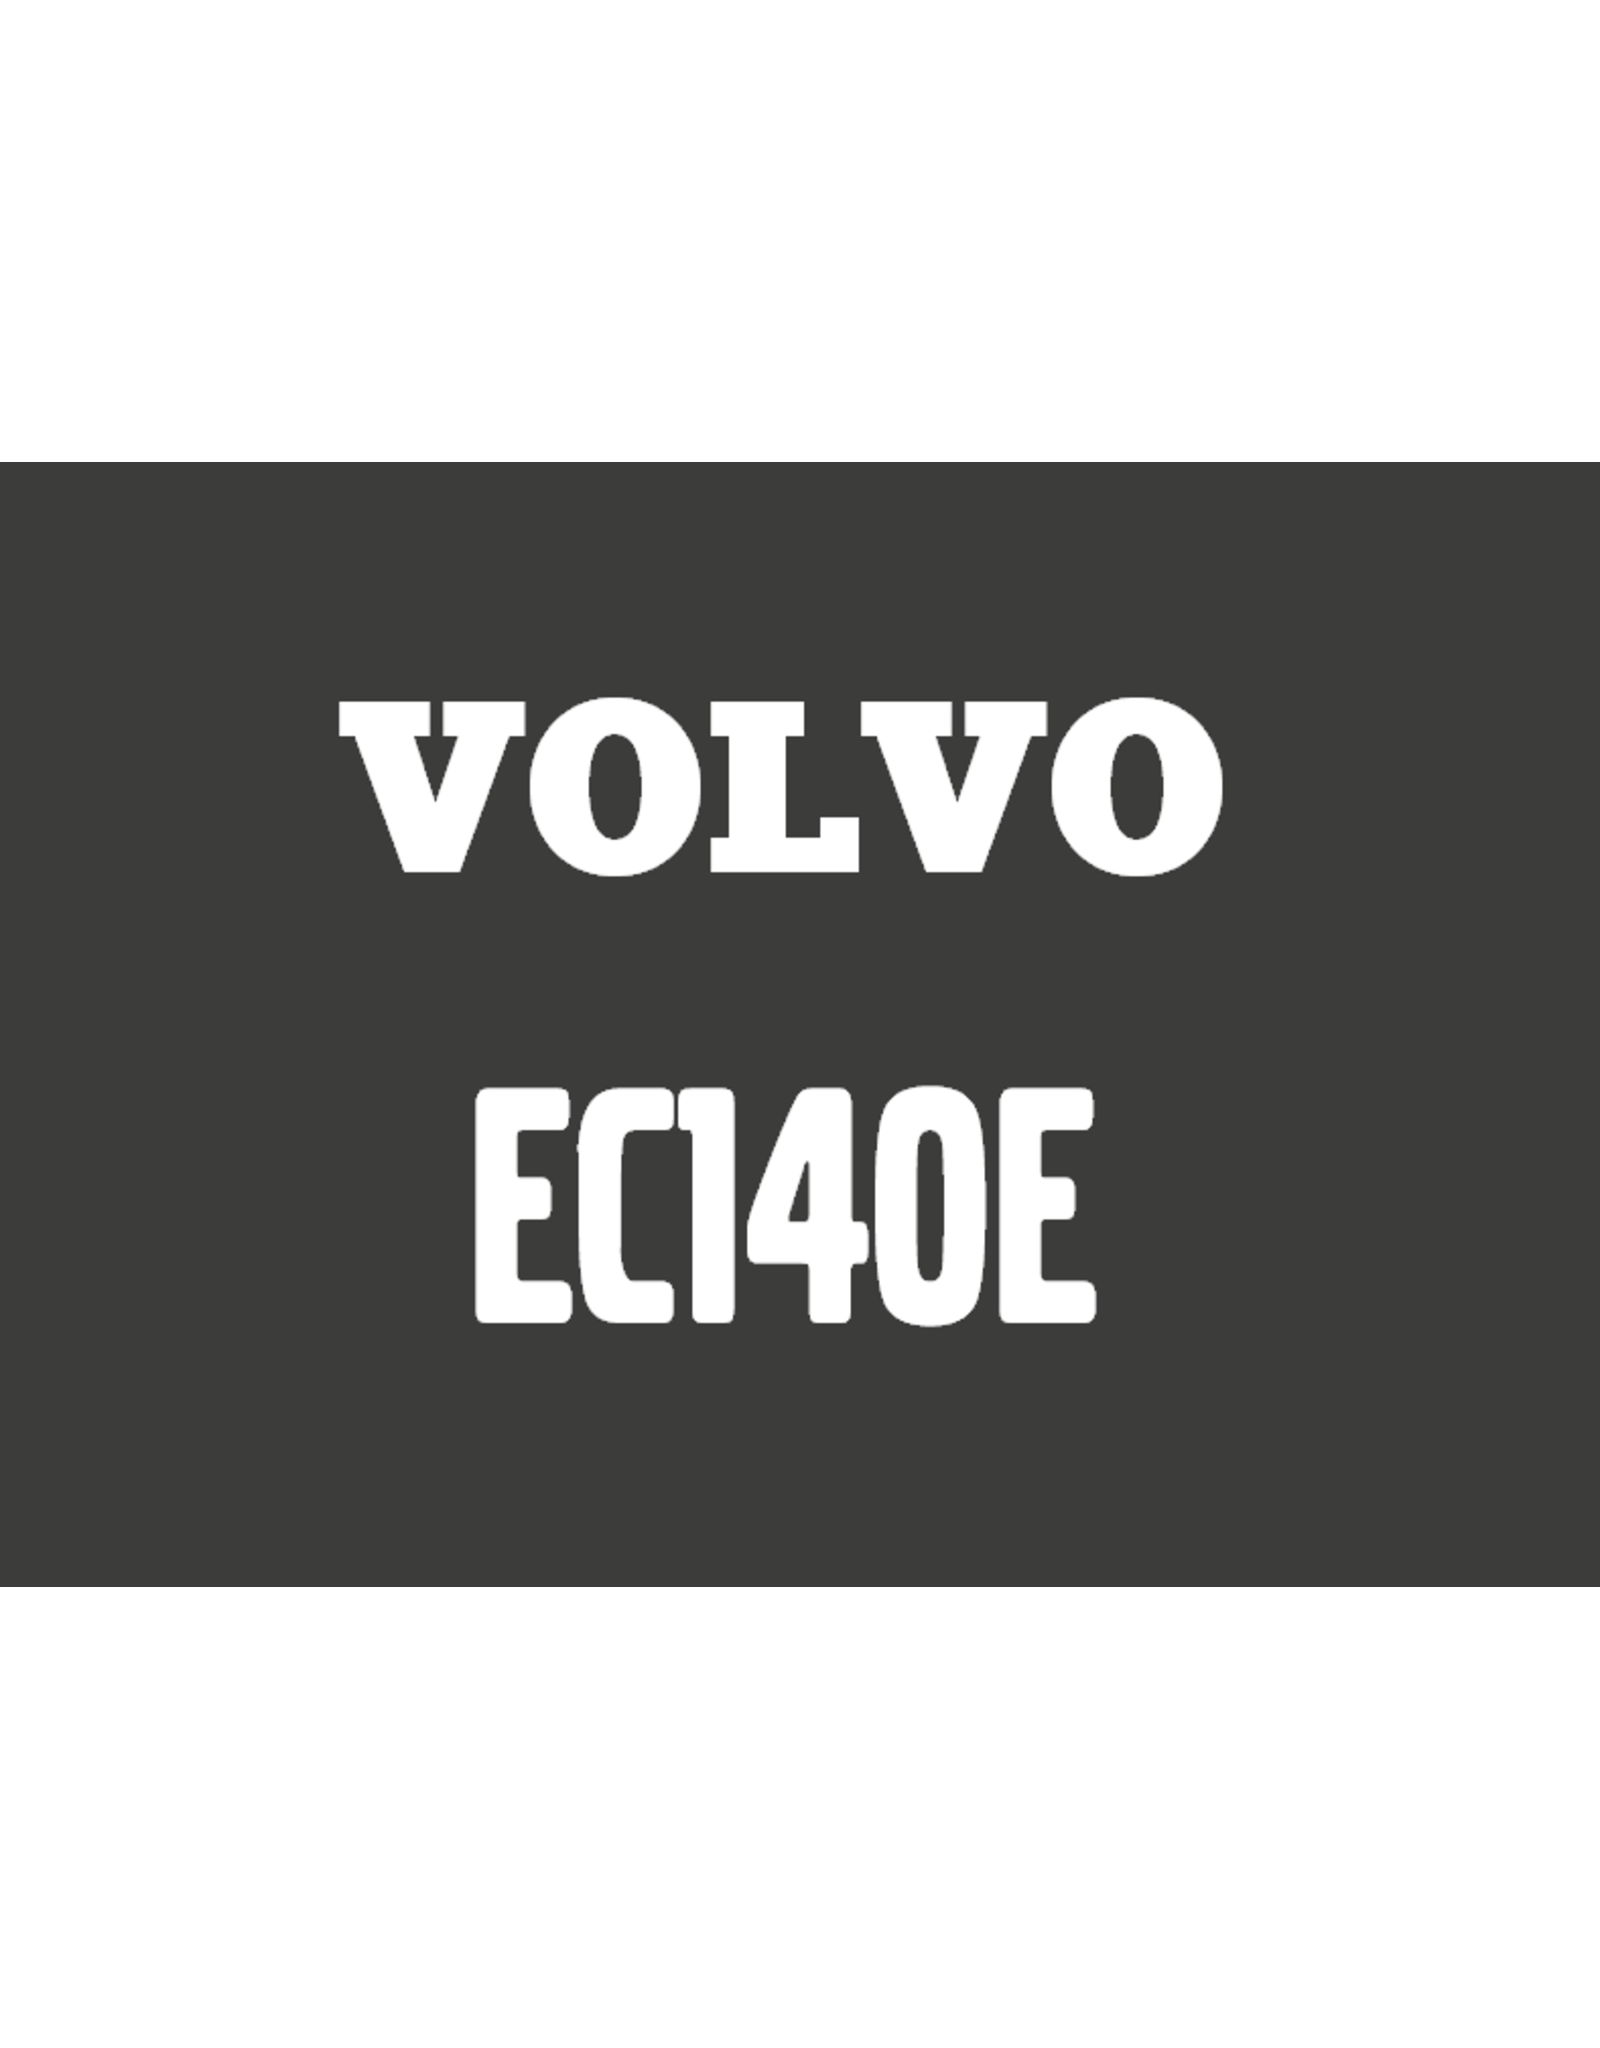 Echle Hartstahl GmbH FOPS für Volvo EC140E